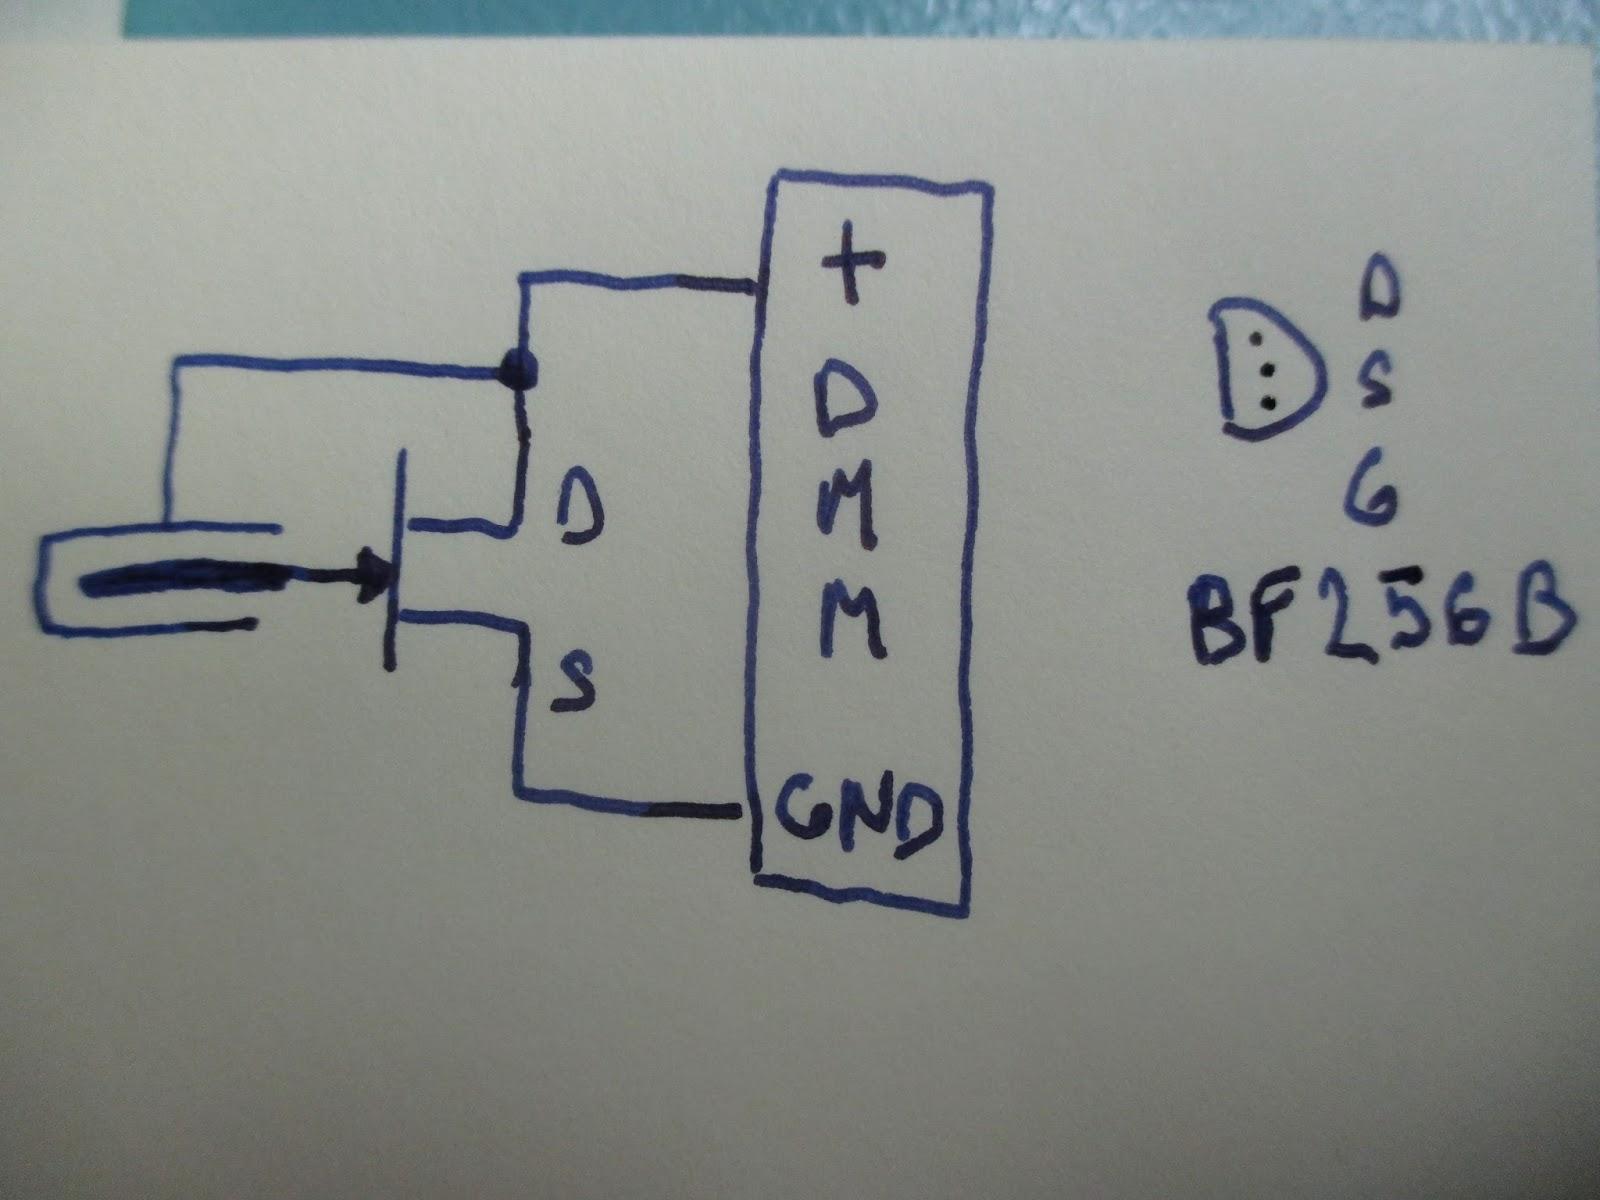 ionization chamber circuit